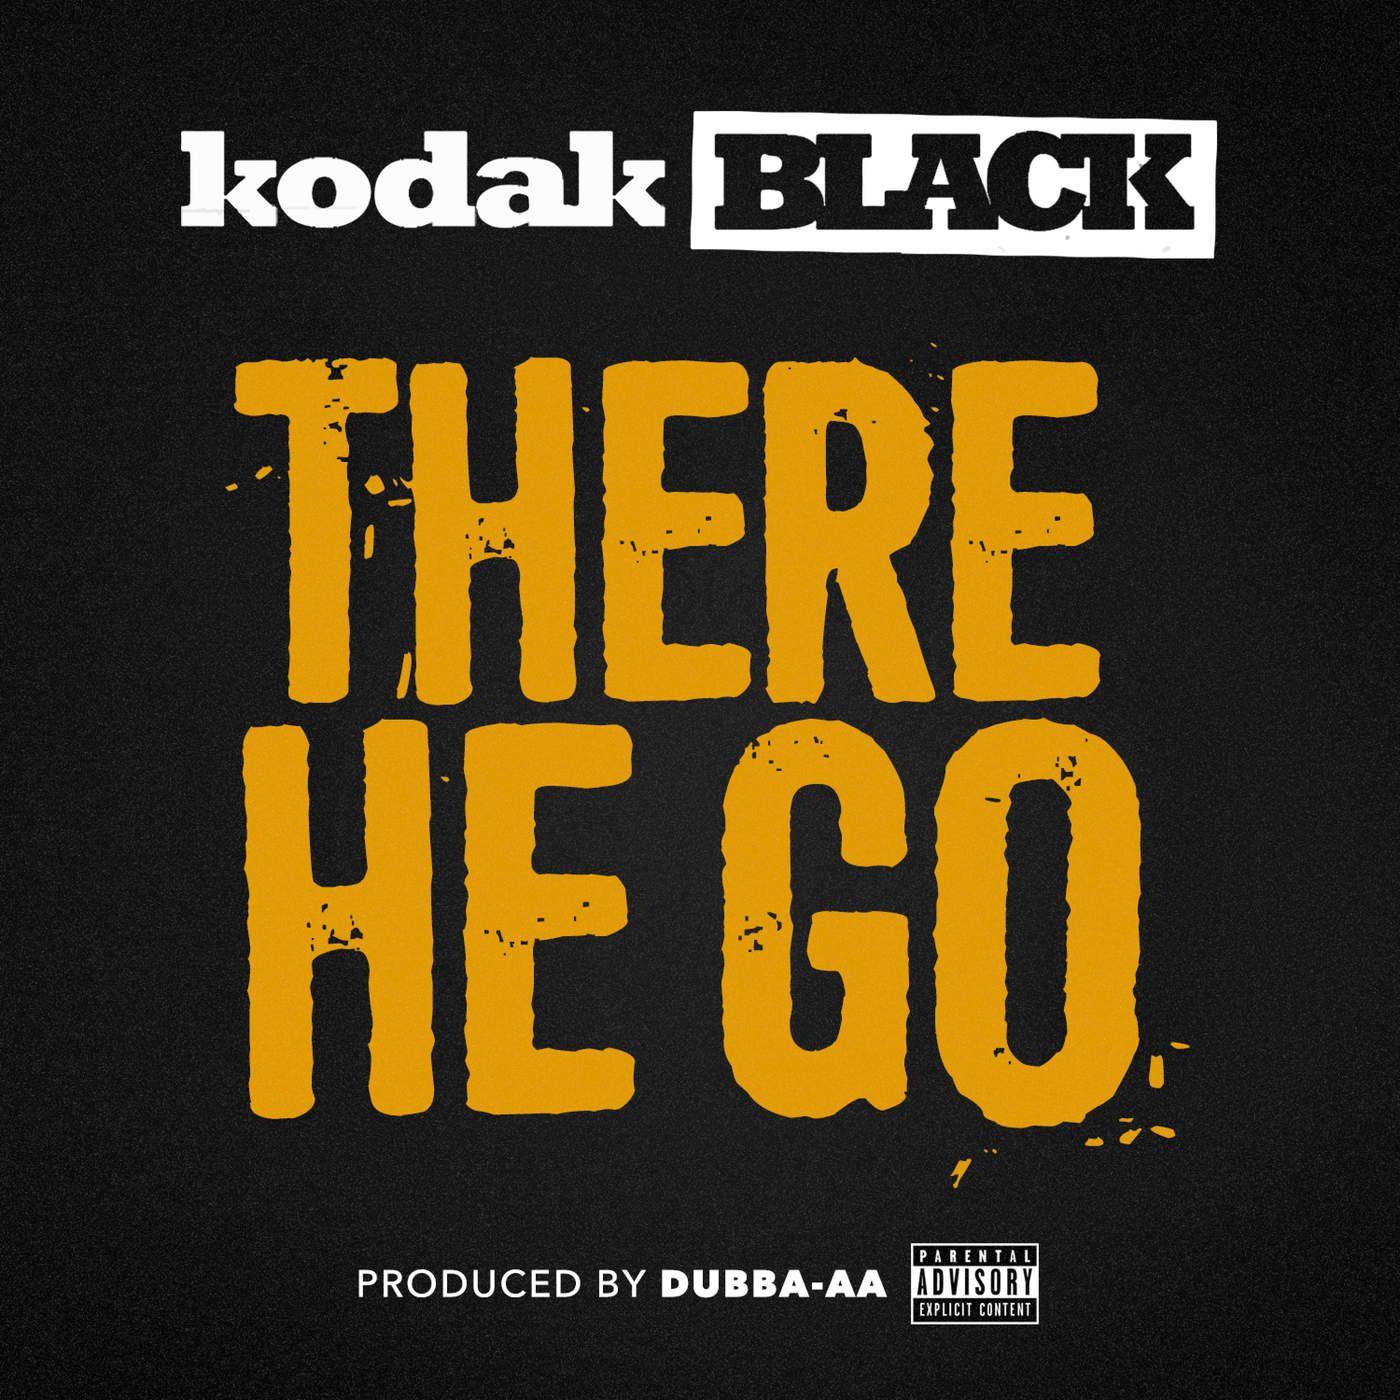 Kodack Black Picture Paint